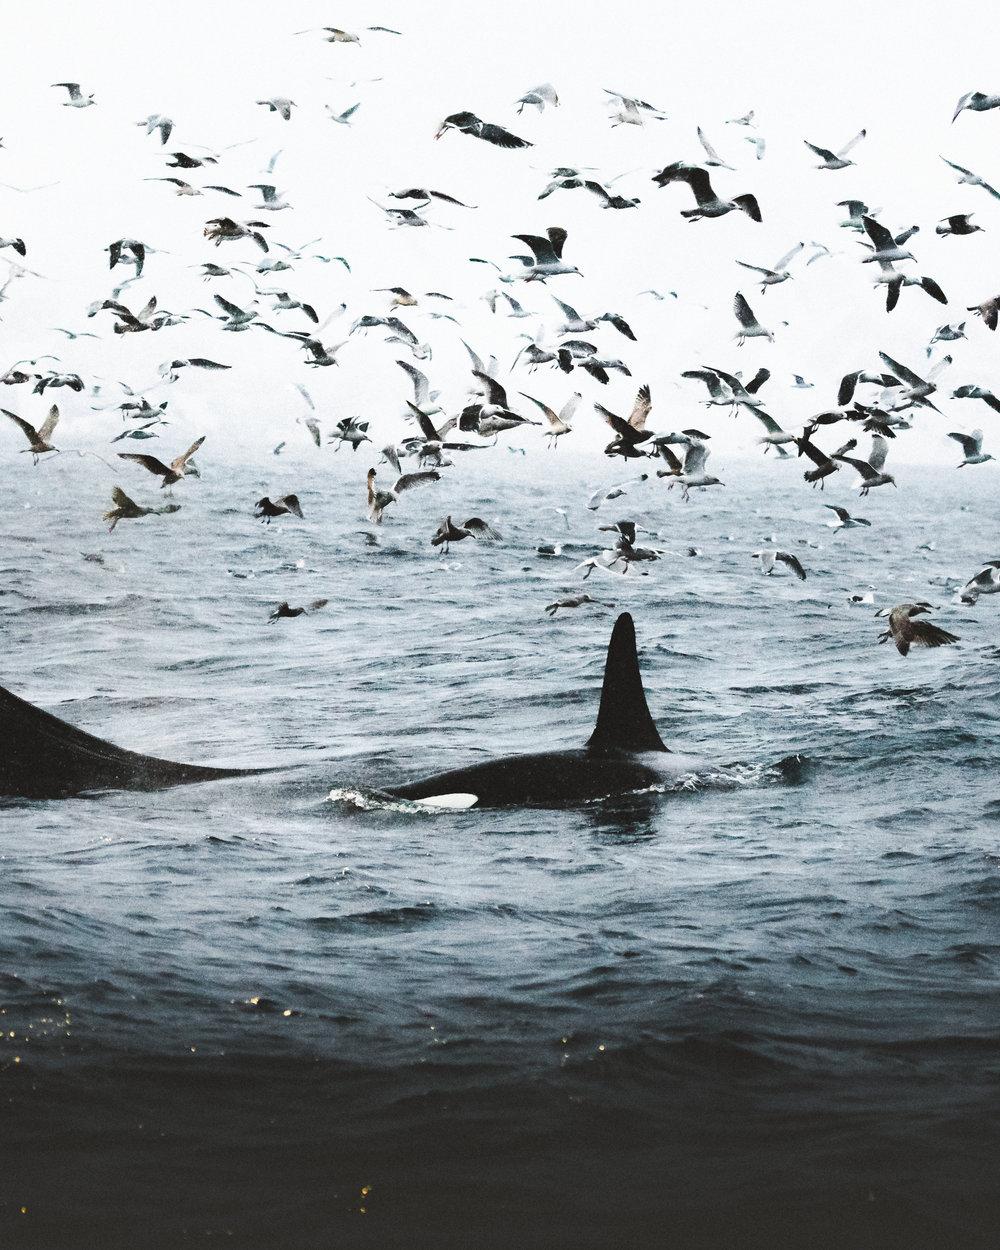 Orcas feeding on fish in open sea, Norway